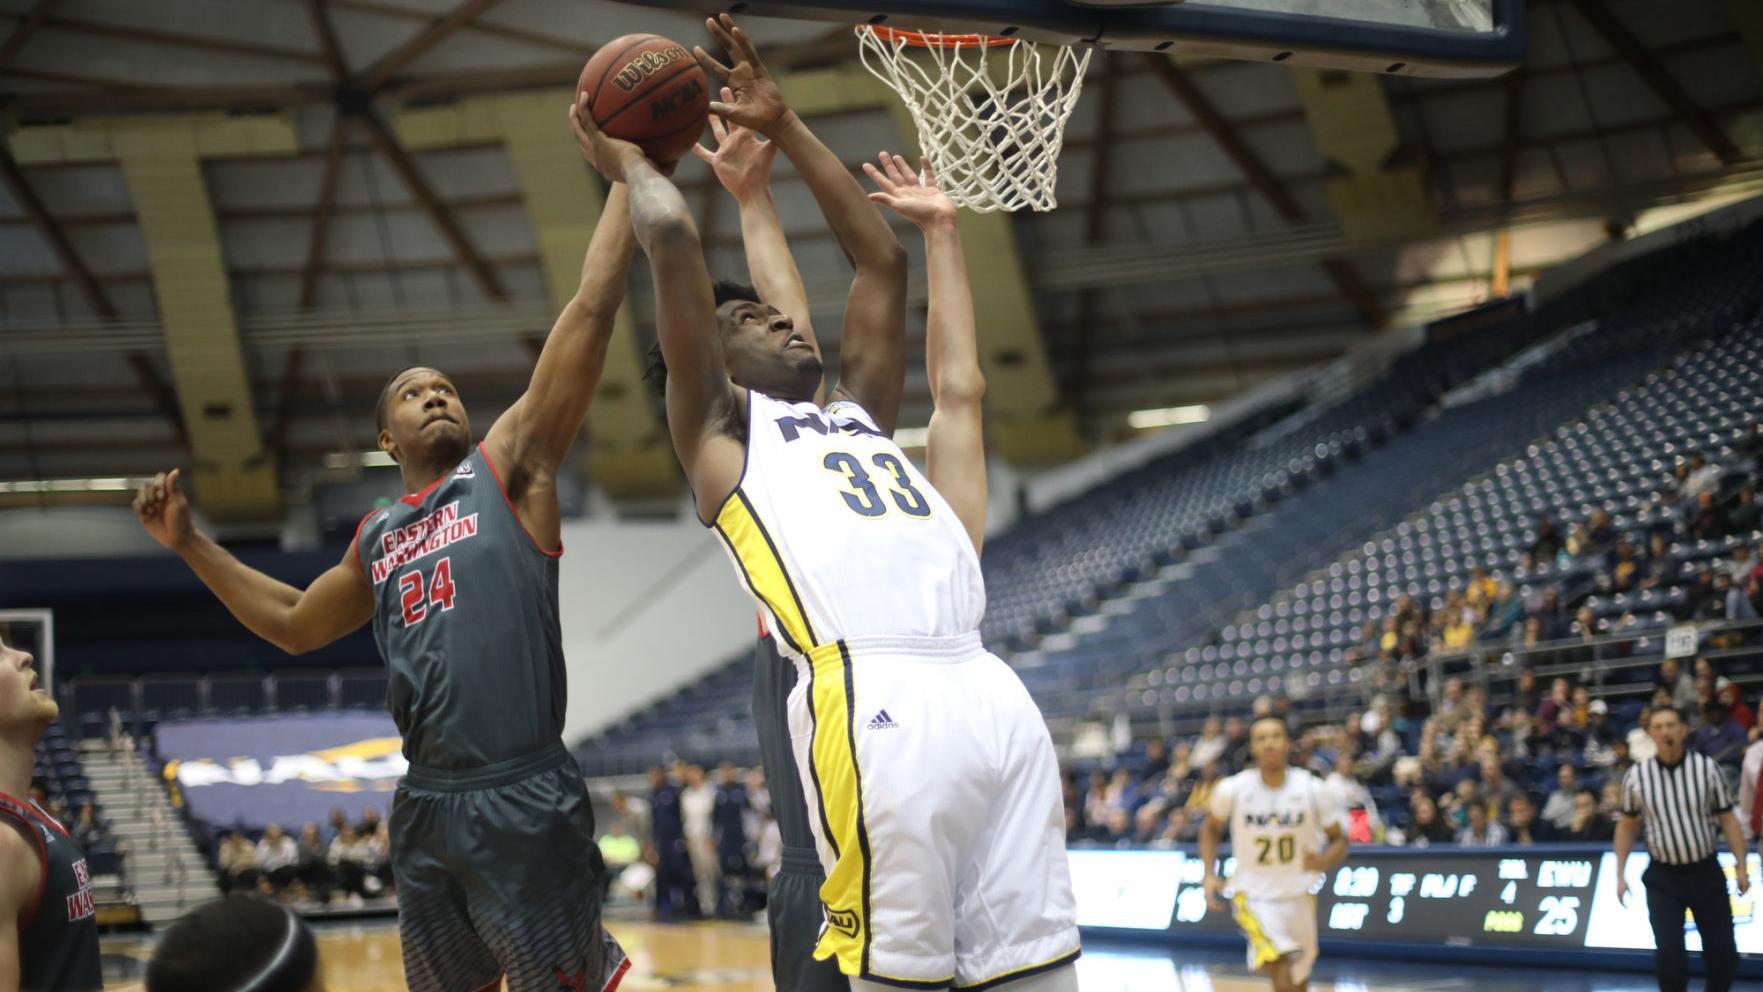 Offensive woes stall NAU men's hoops in home loss to EWU